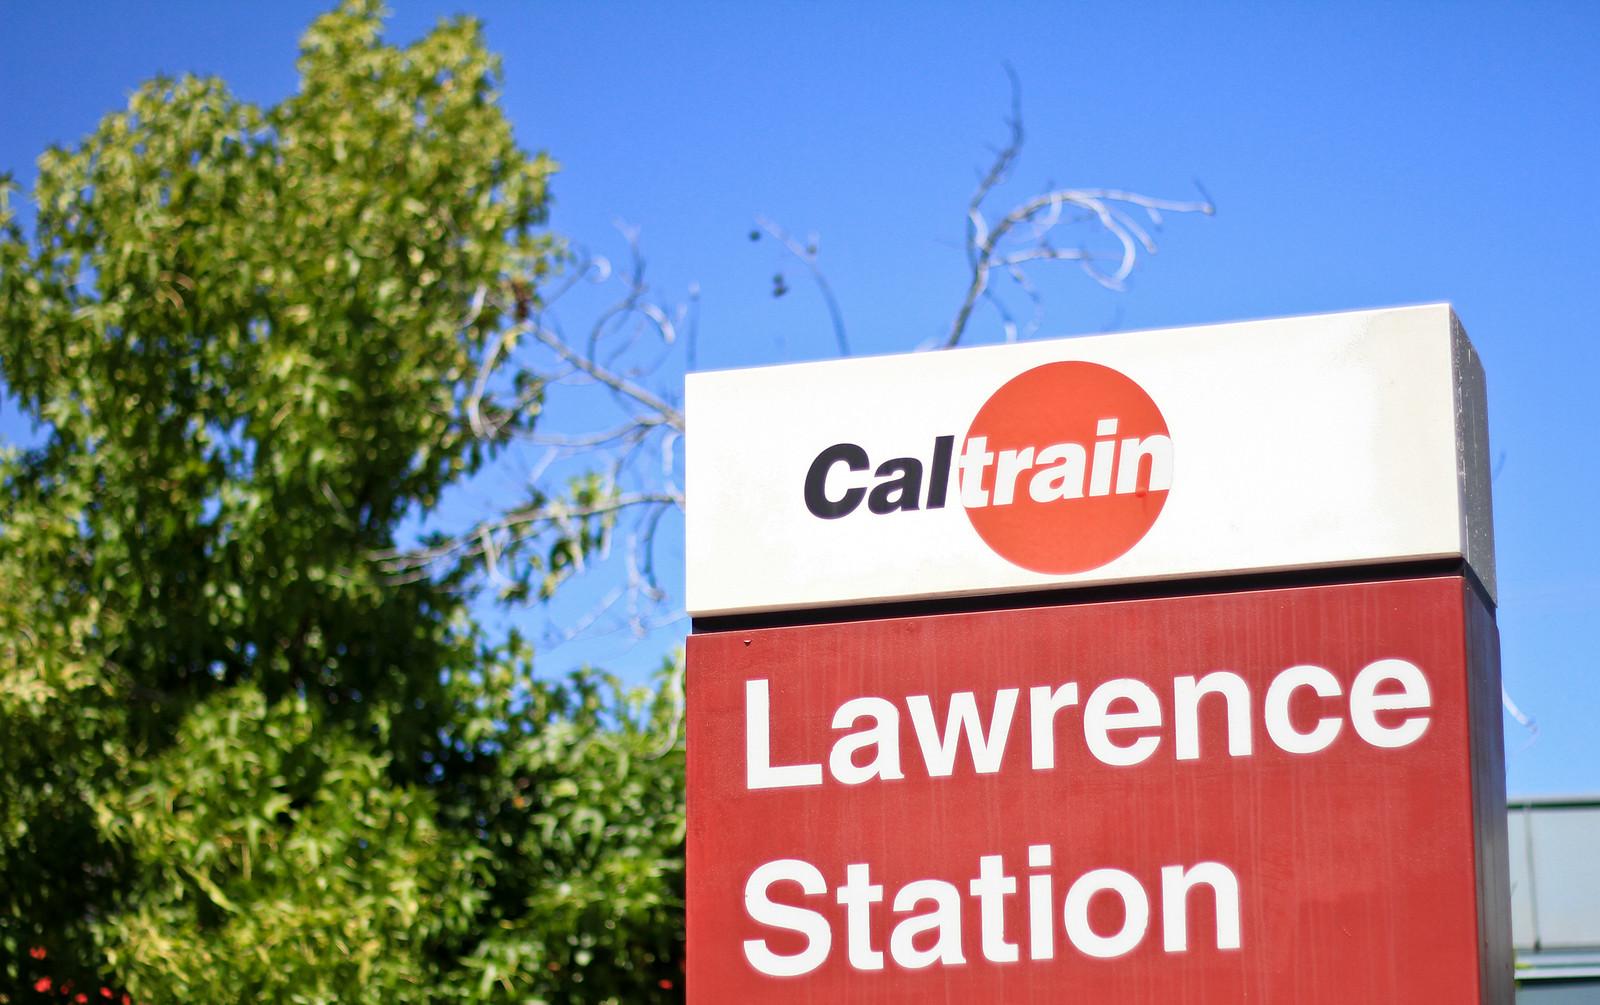 Caltrain Lawrence.jpg